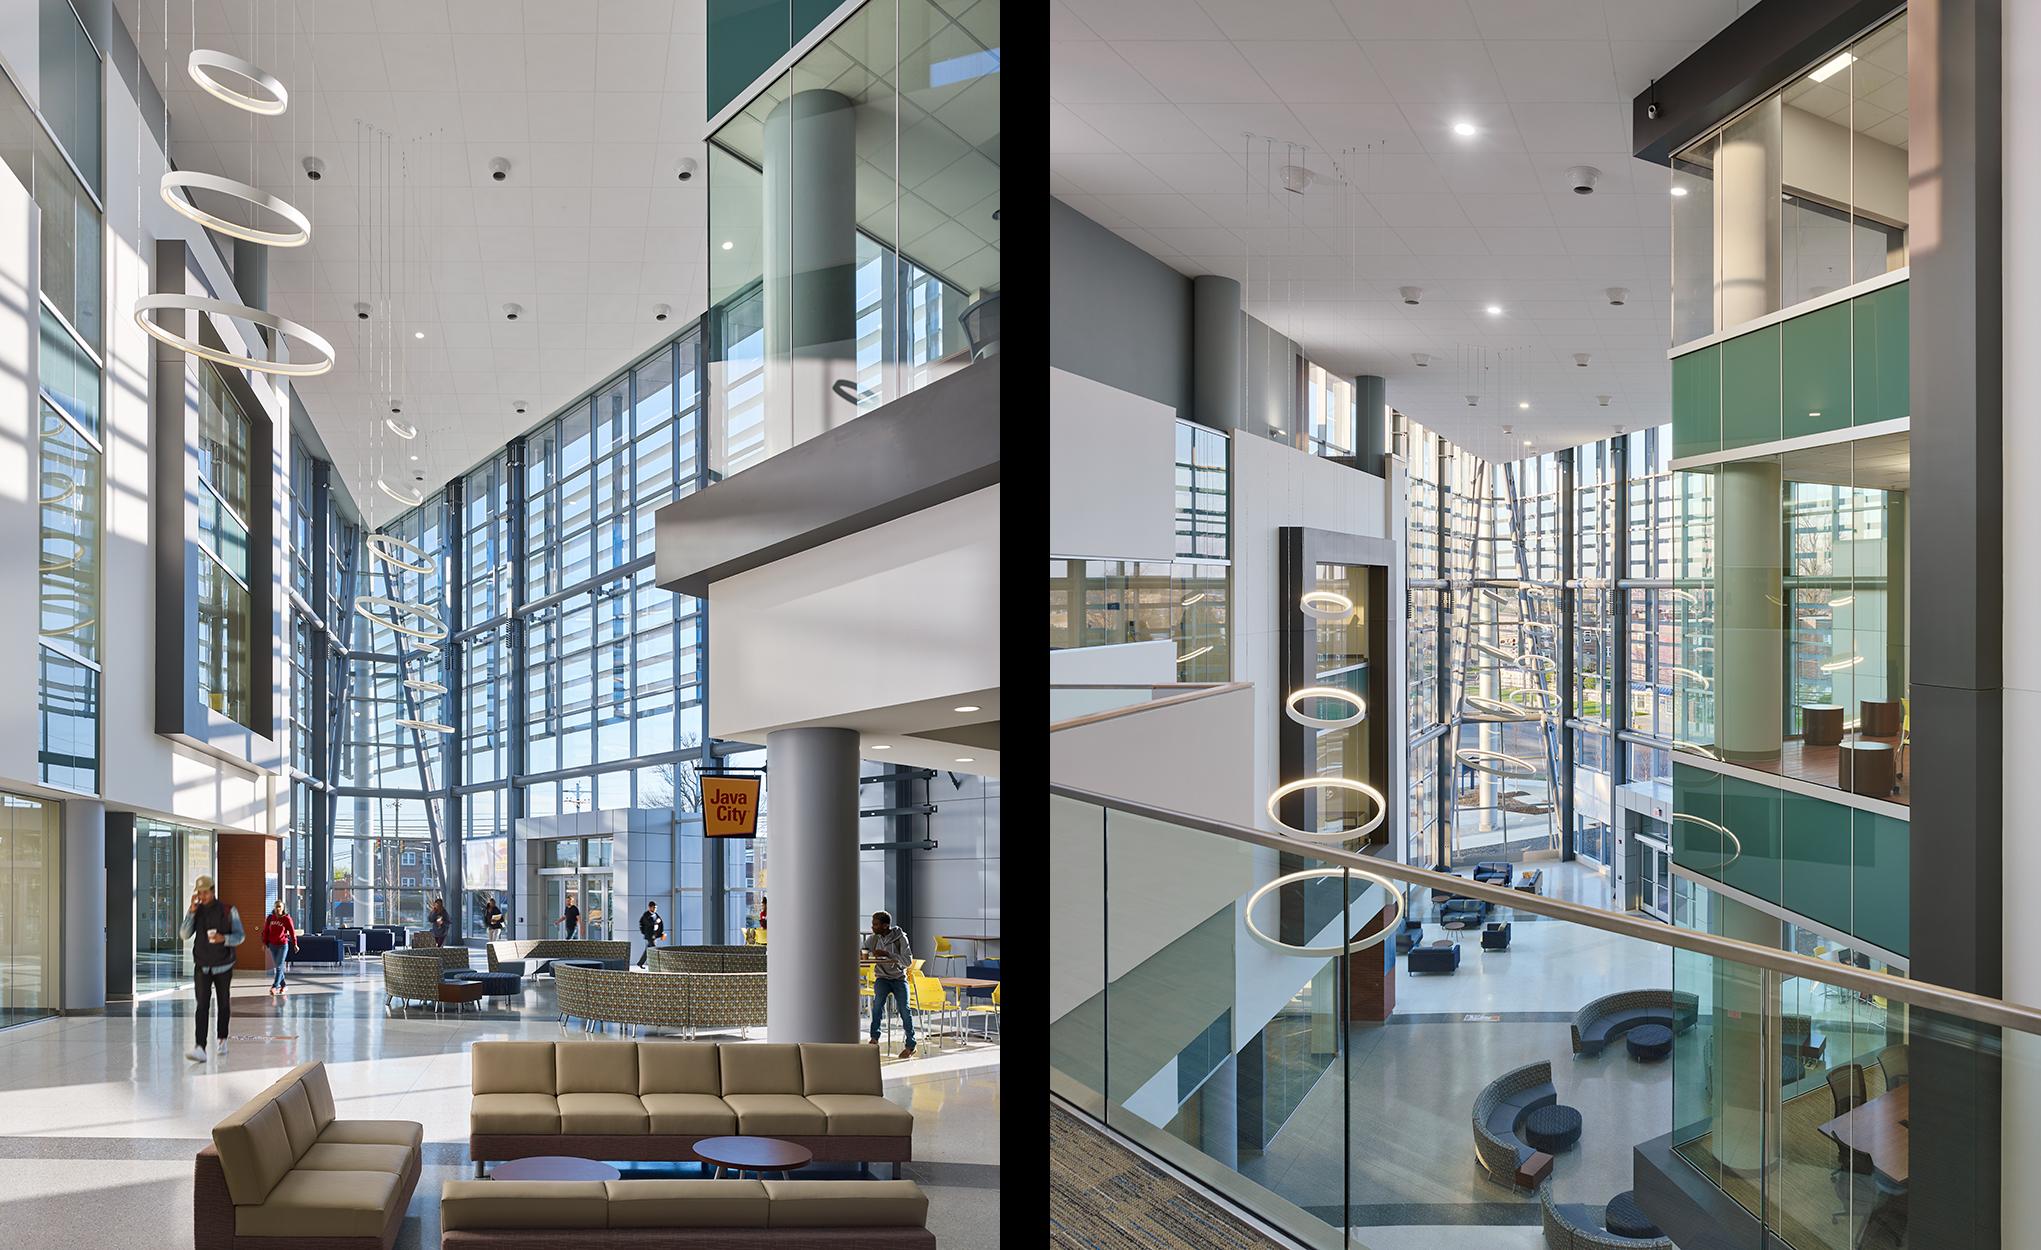 Kimmel Bogrette Architects